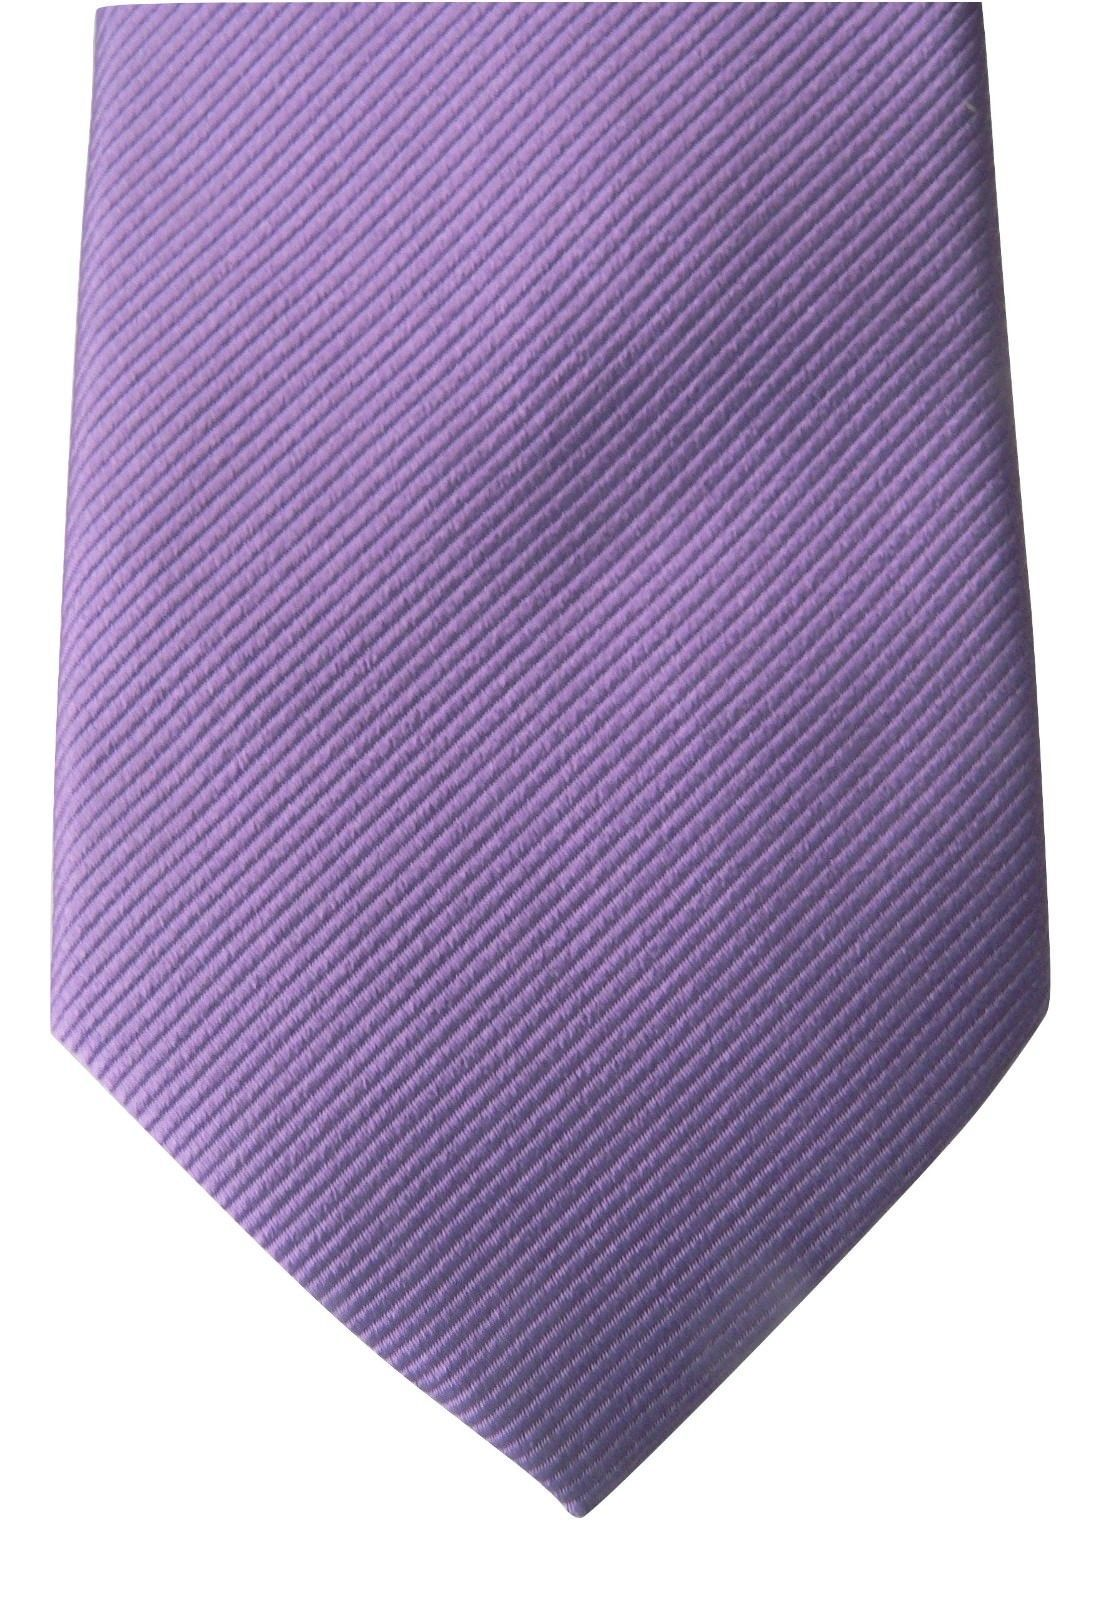 NWT GIORGIO ARMANI black label Italy silk tie necktie purple lavender $245 sharp - $144.53